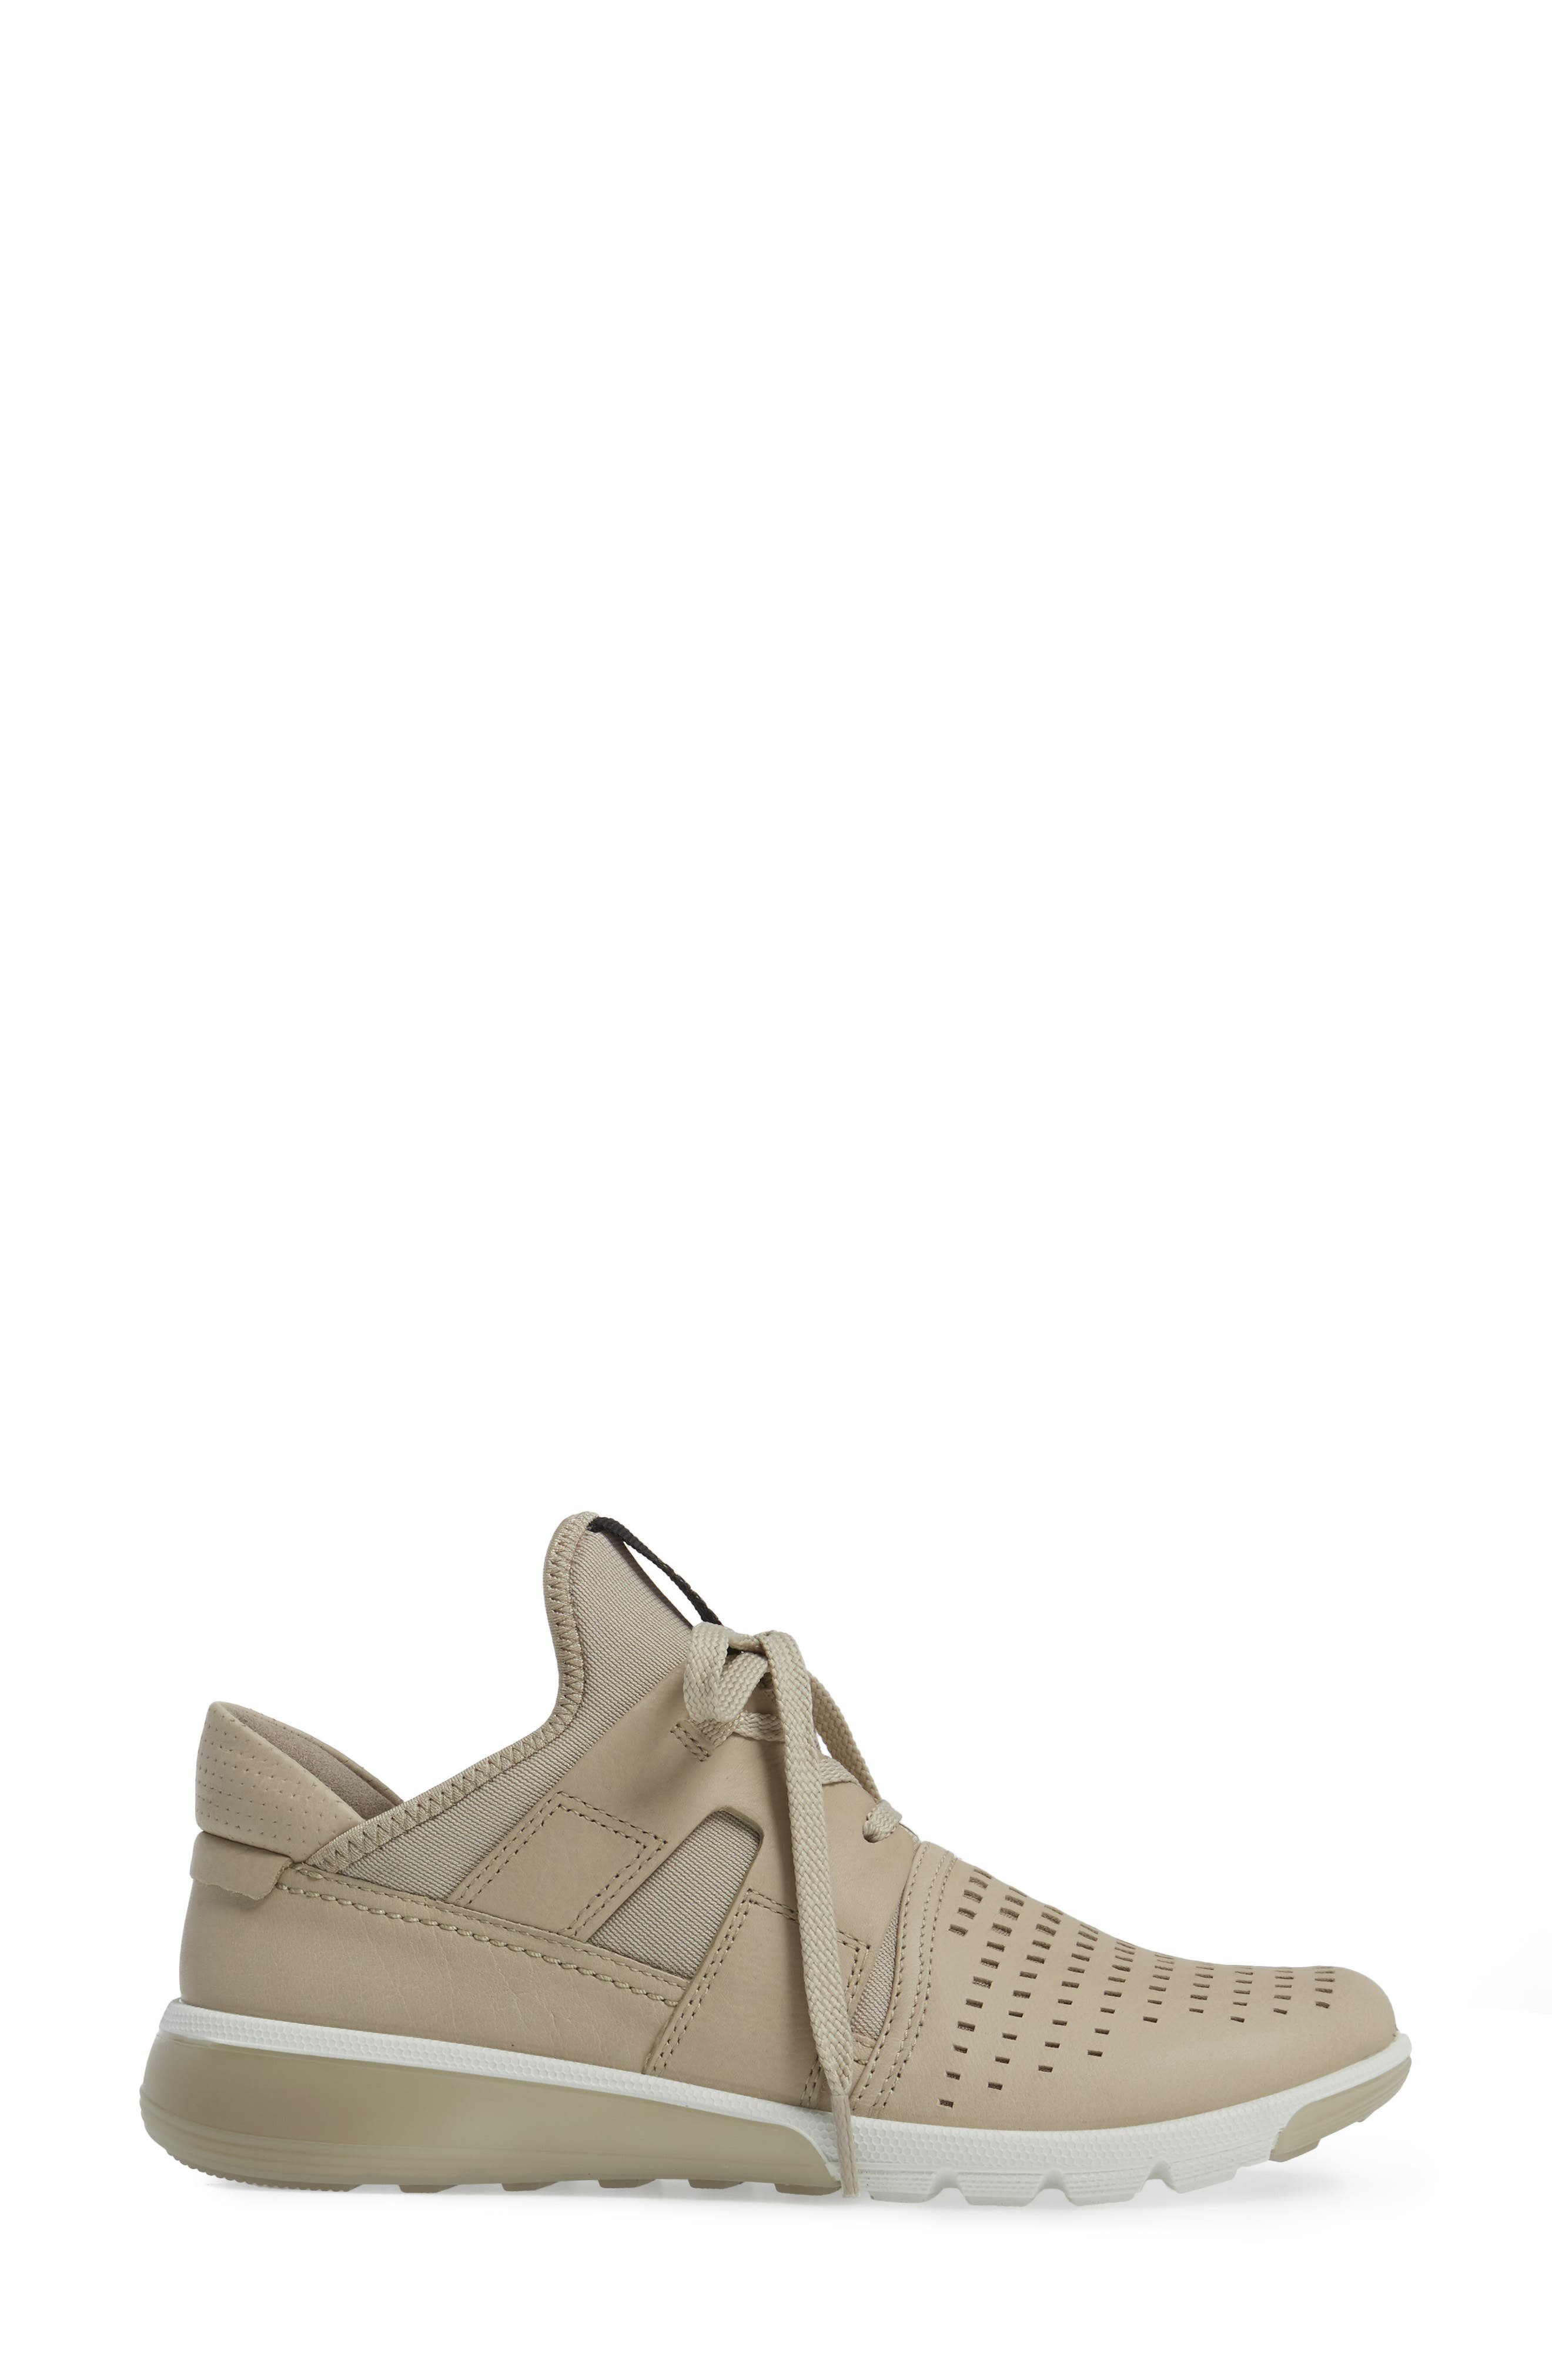 Intrinsic 2 Sneaker,                             Alternate thumbnail 6, color,